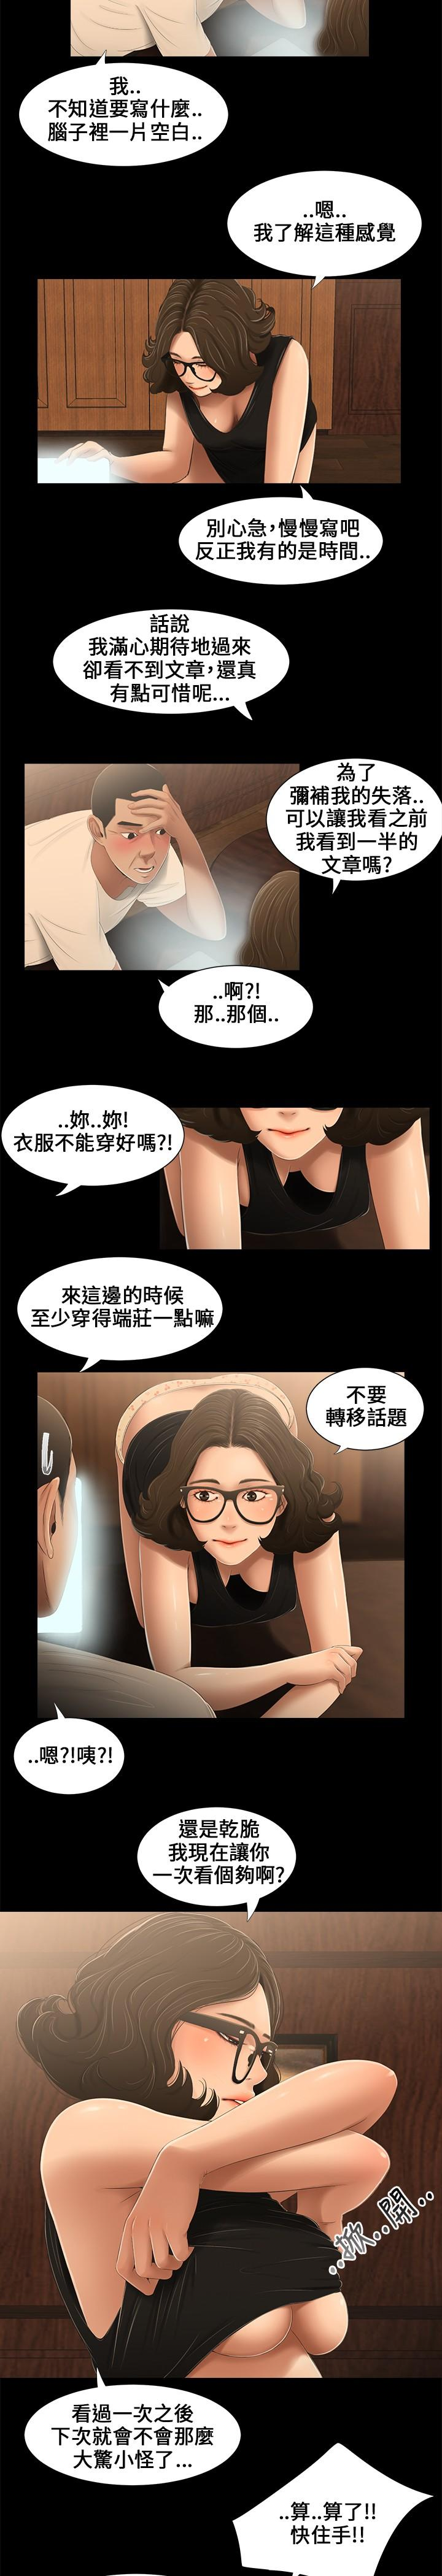 Three sisters 三姐妹Ch.13~19 (Chinese)中文 40